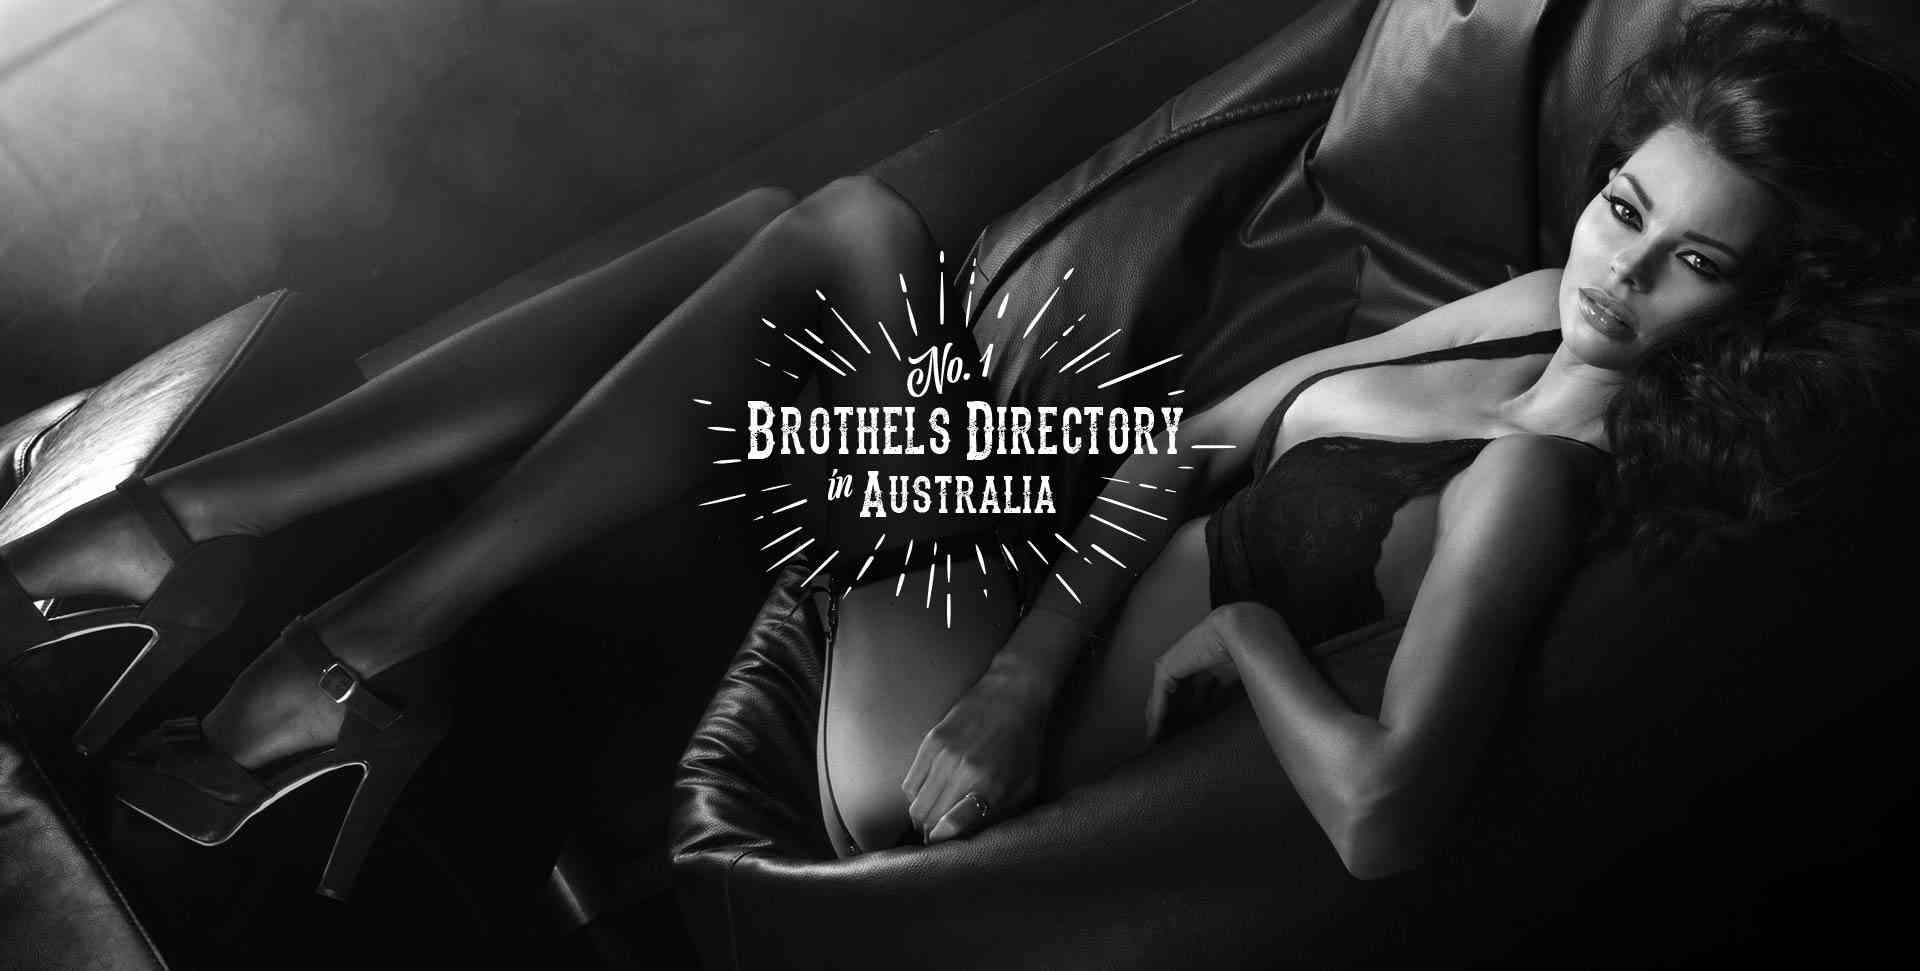 Brothels Directory Australia